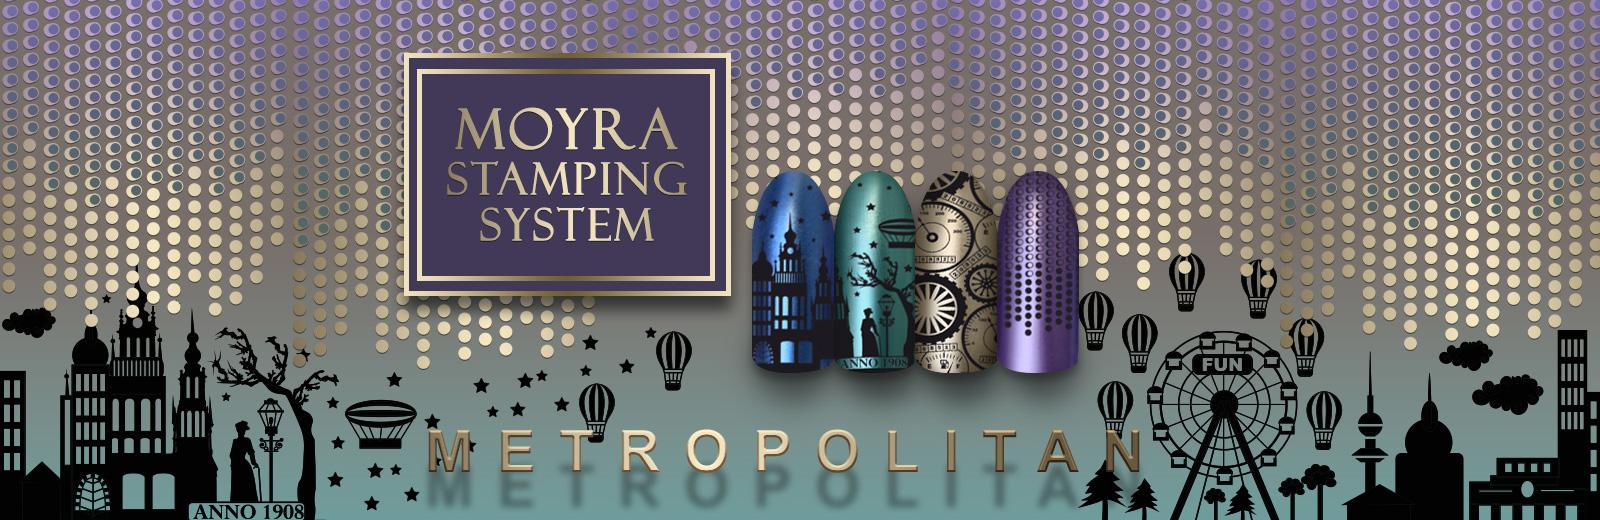 Moyra stamping plate No.63 Metropolitan